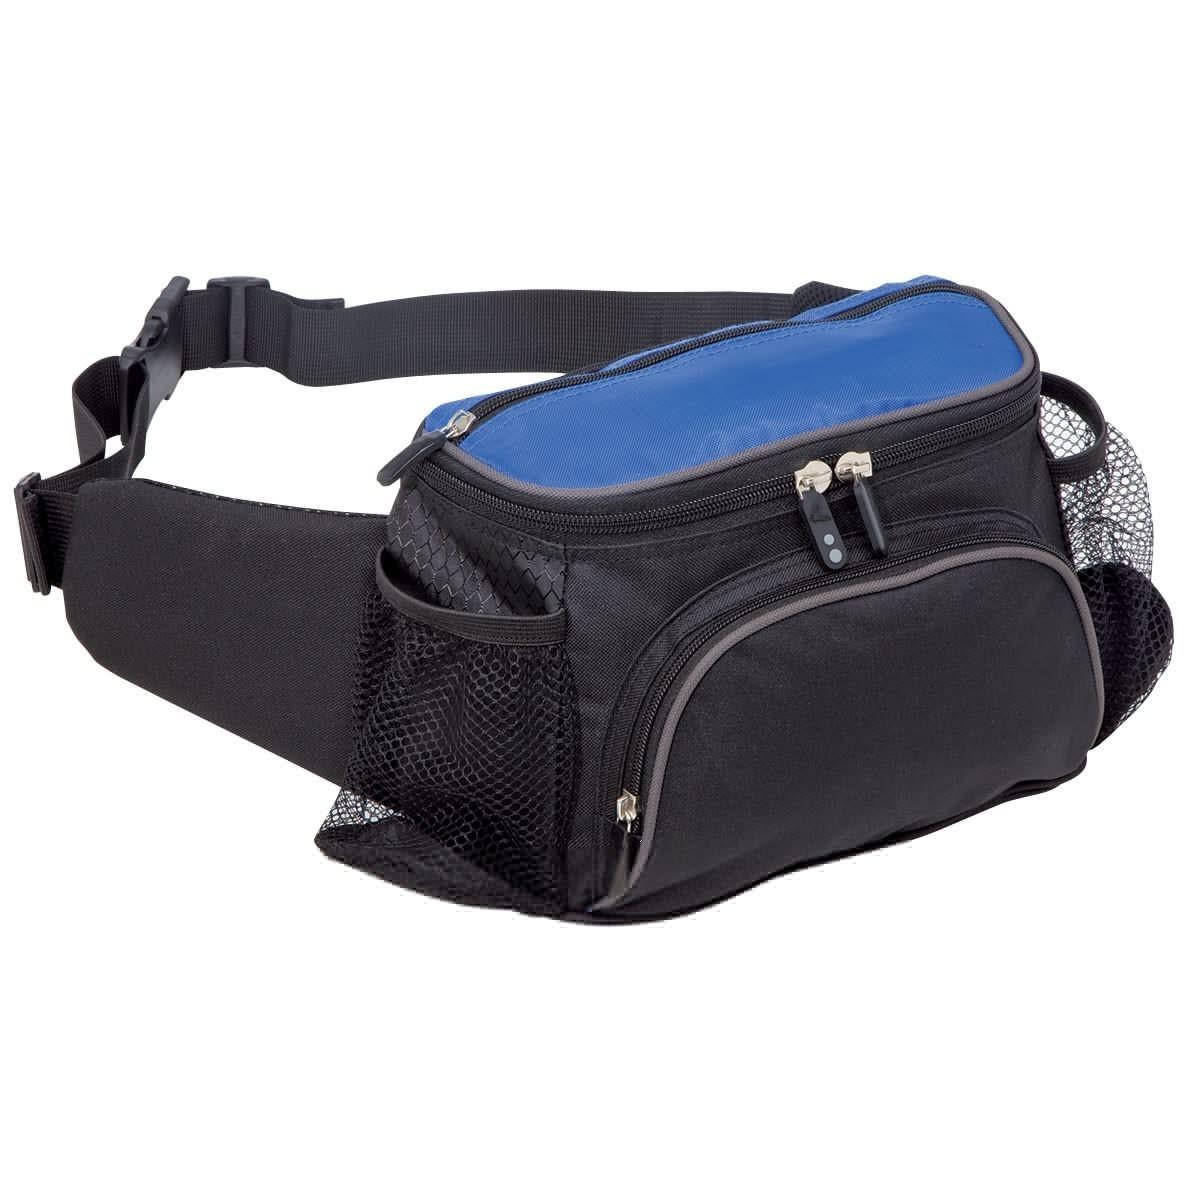 Sportlite Hiking Waist Bags